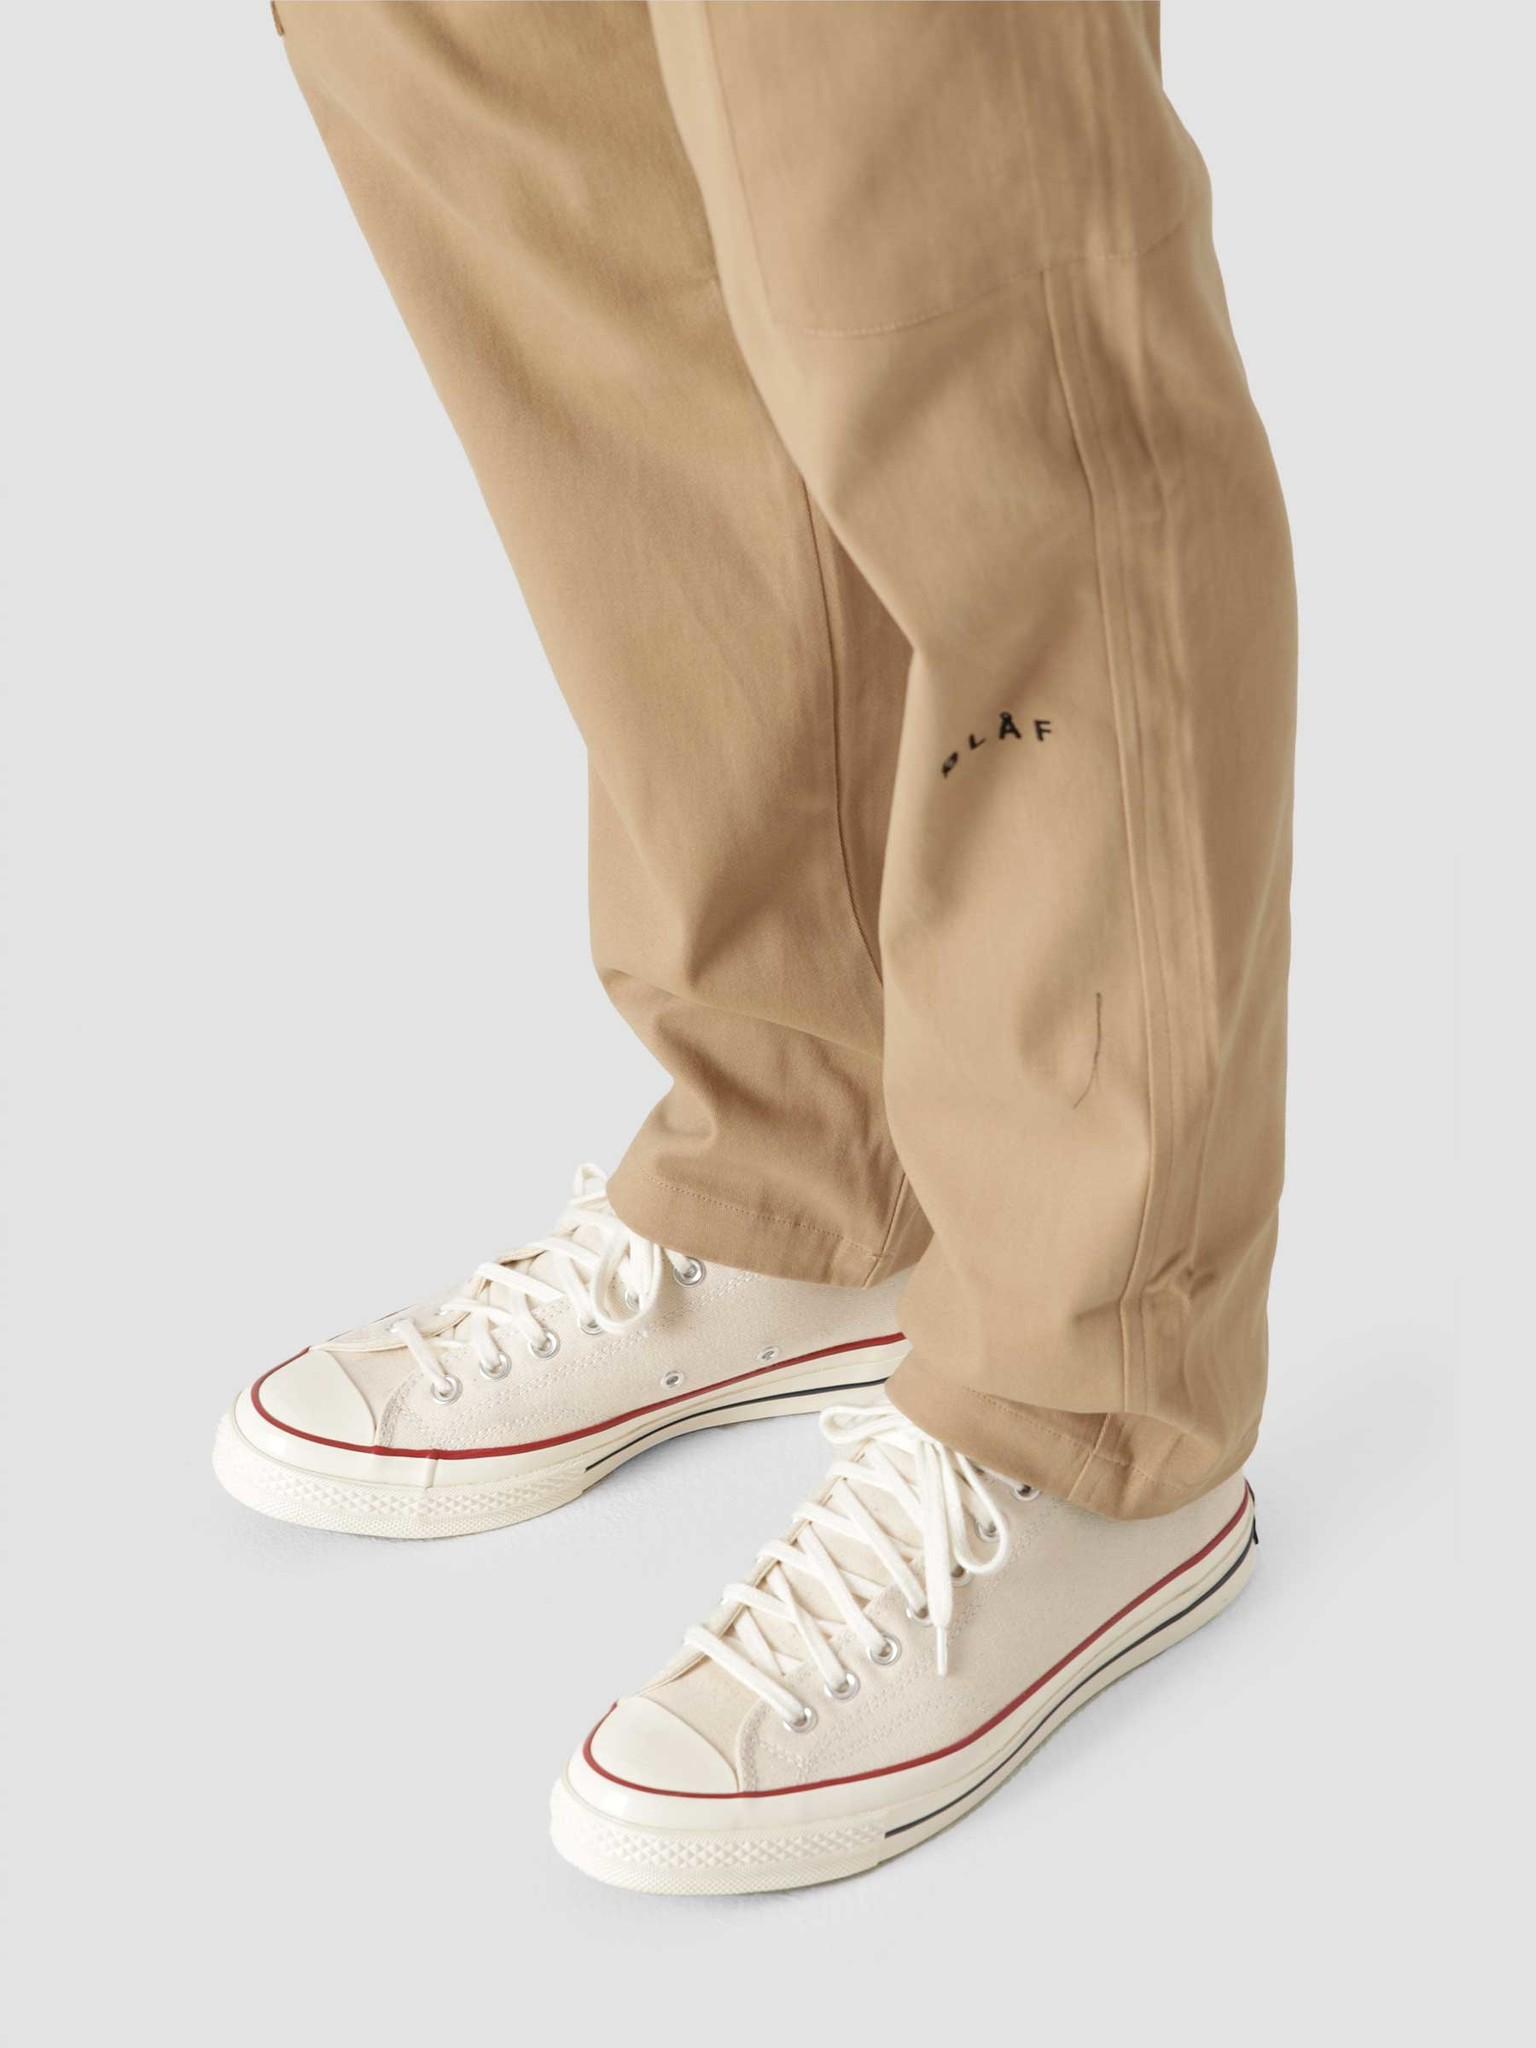 OLAF Cargo Pants Khaki